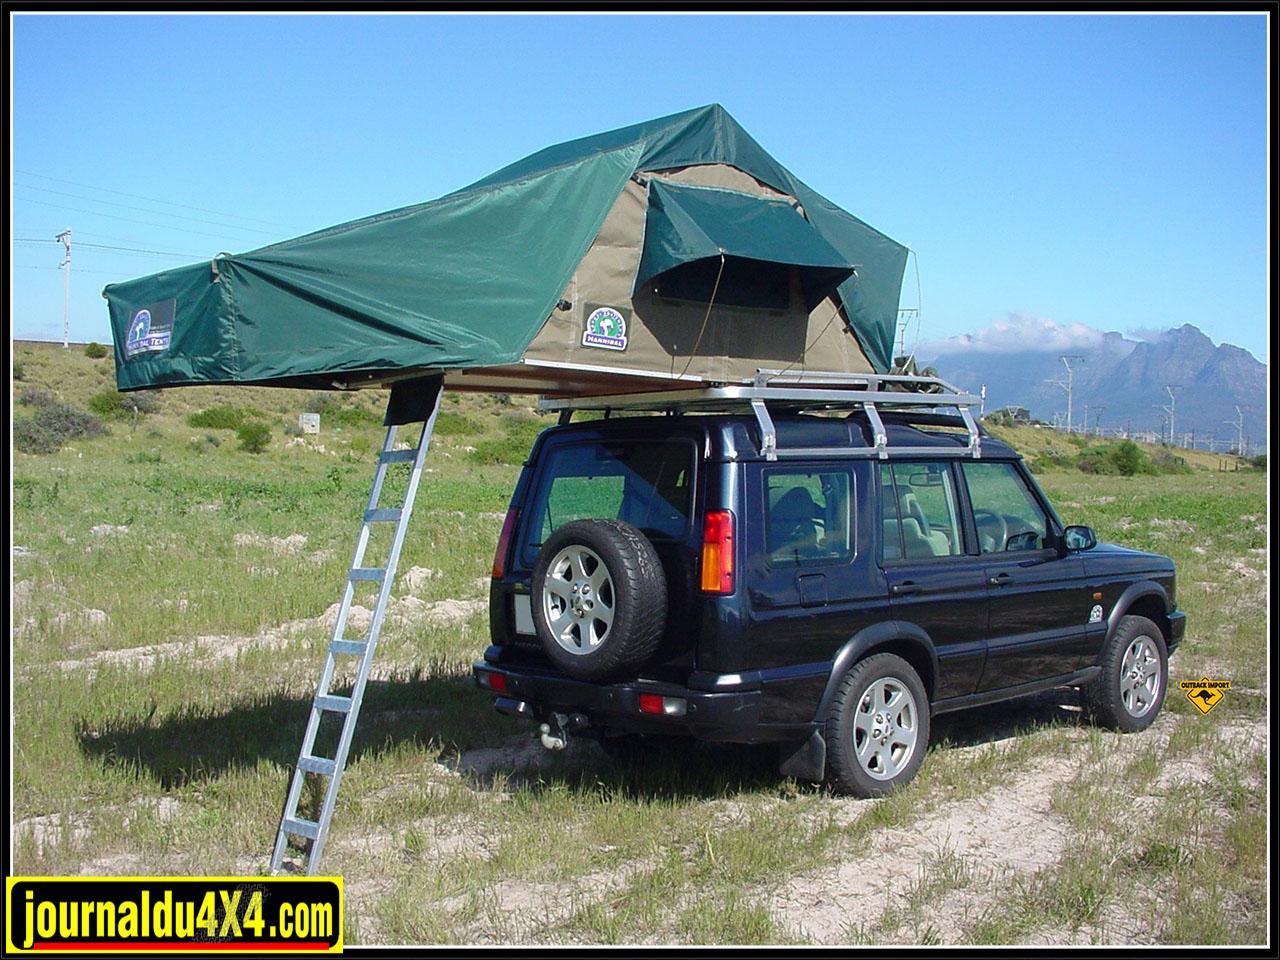 Tente Jumbo Fly HANNIBAL 1,20m / 1,4m / 1,6m / 2m